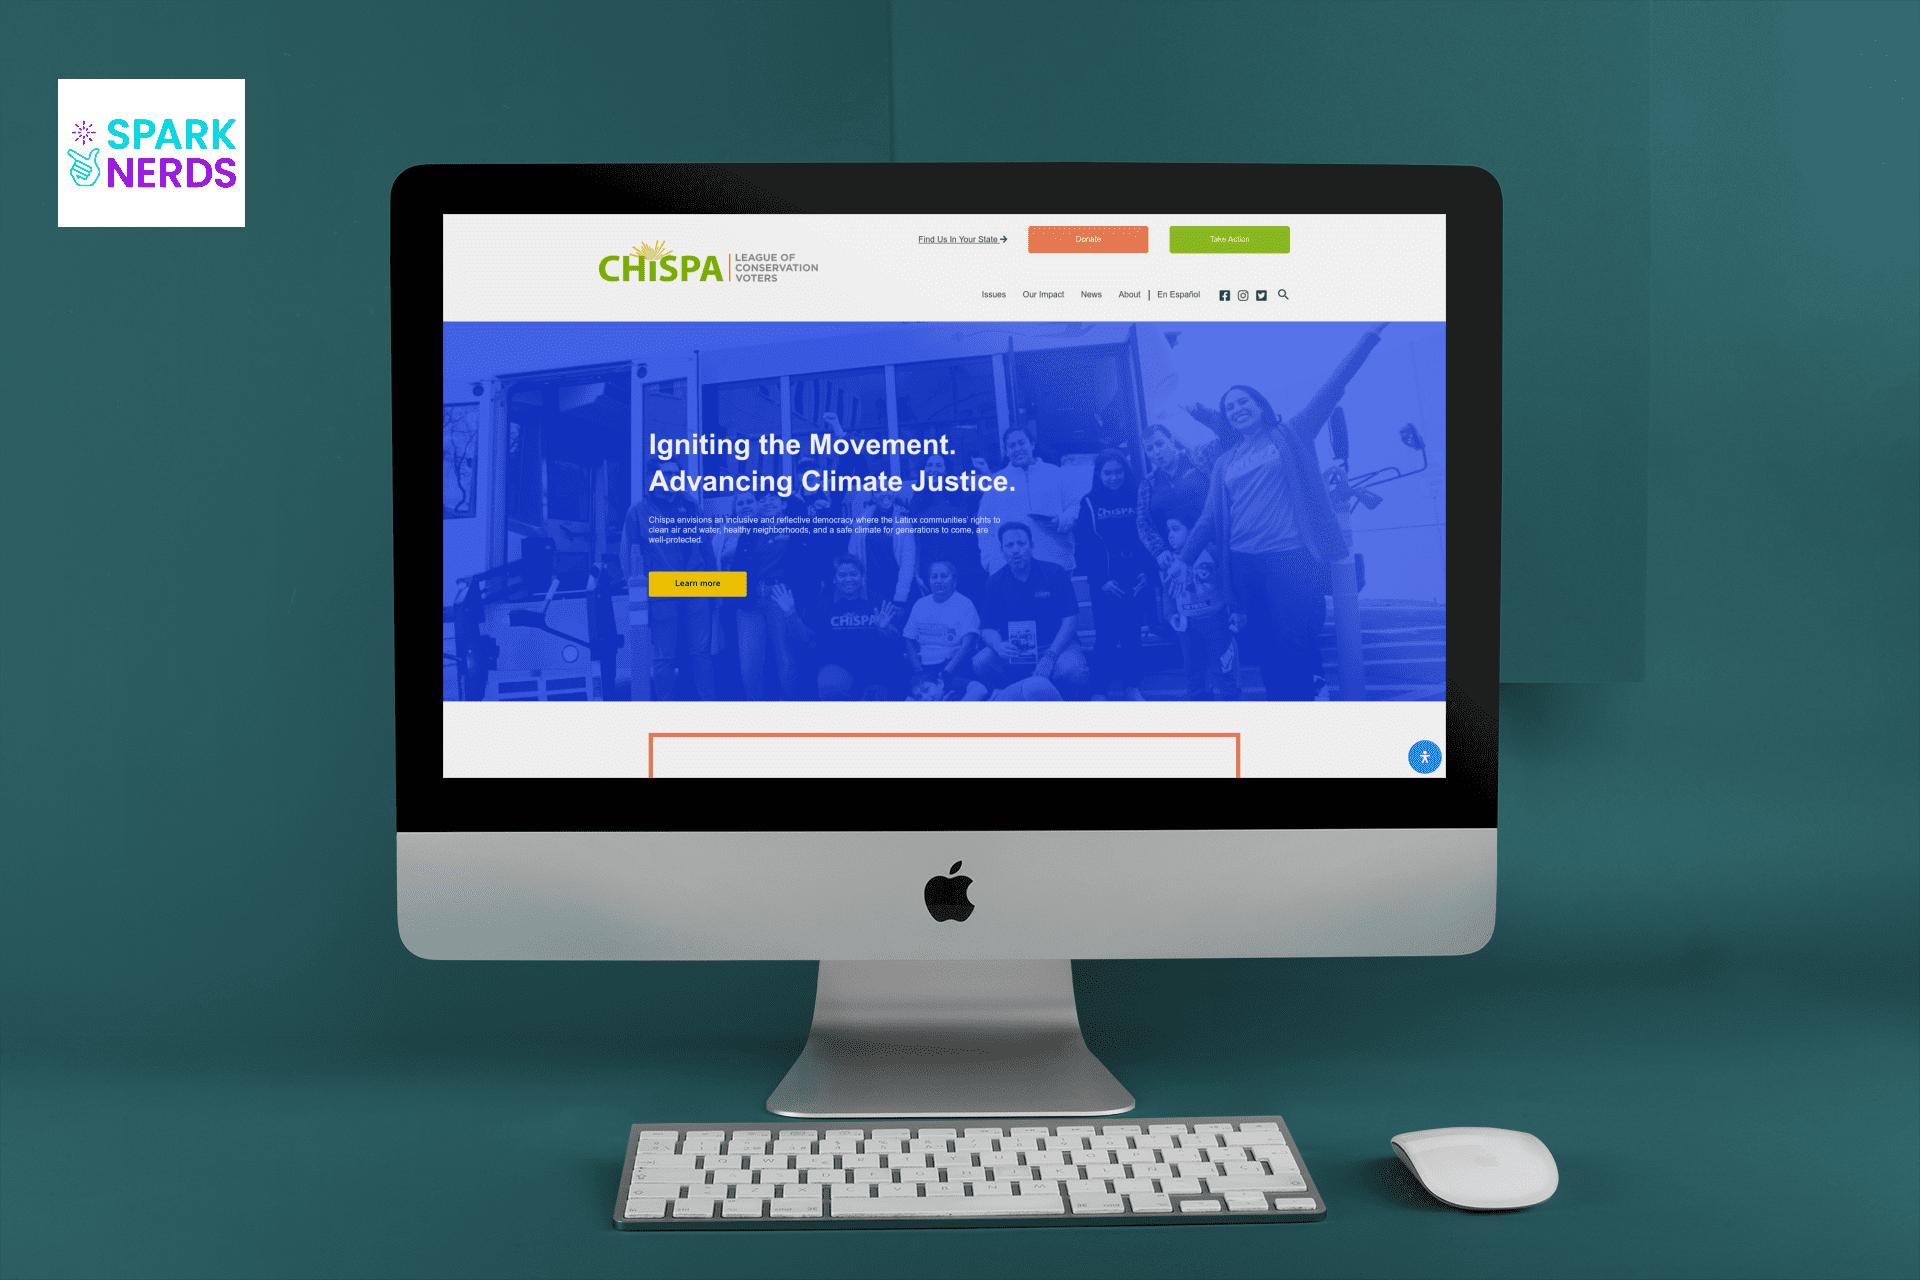 new chispa lcv website by sparknerds